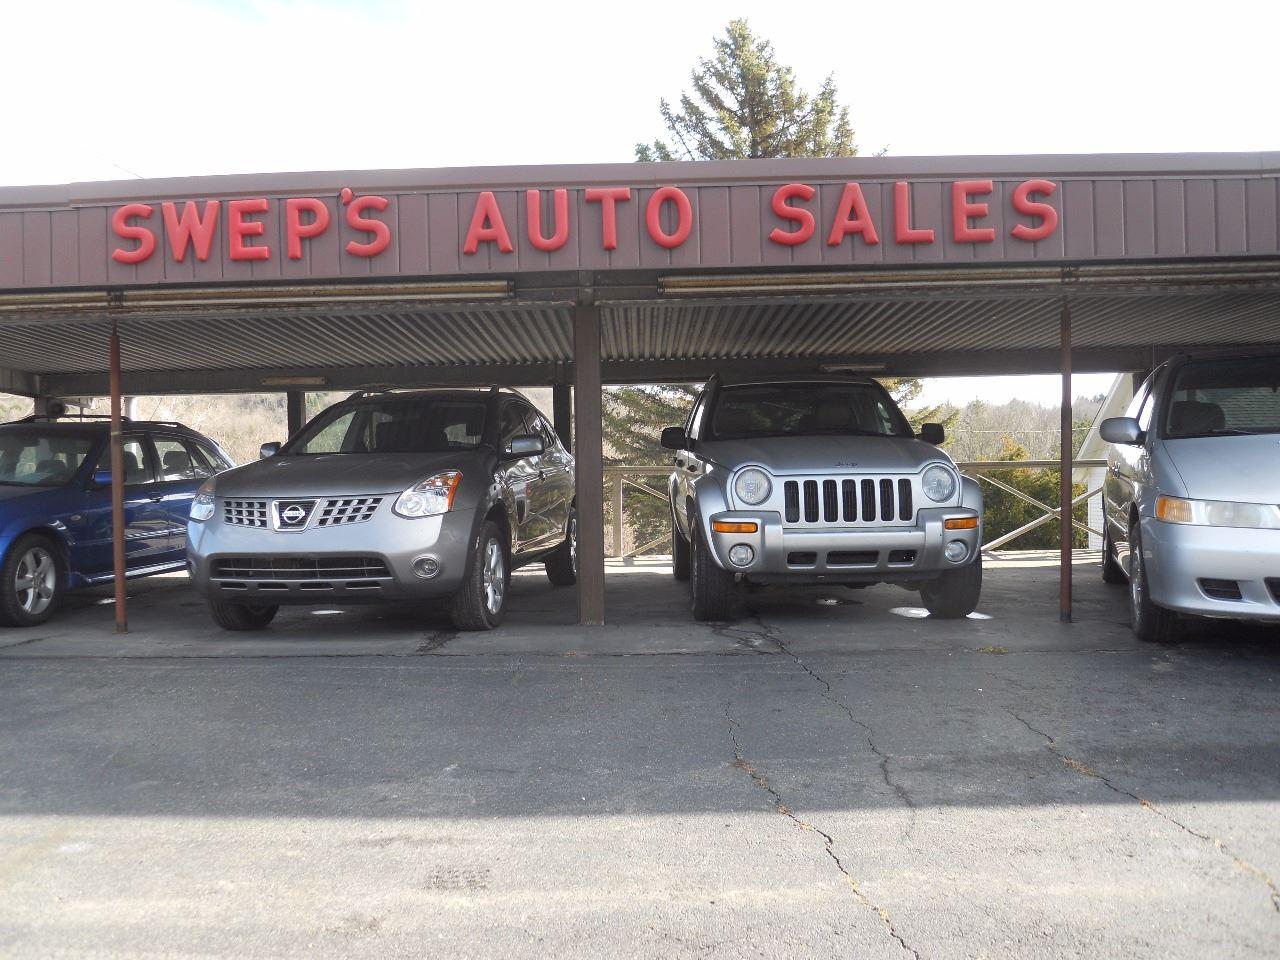 Swep's Auto Sales